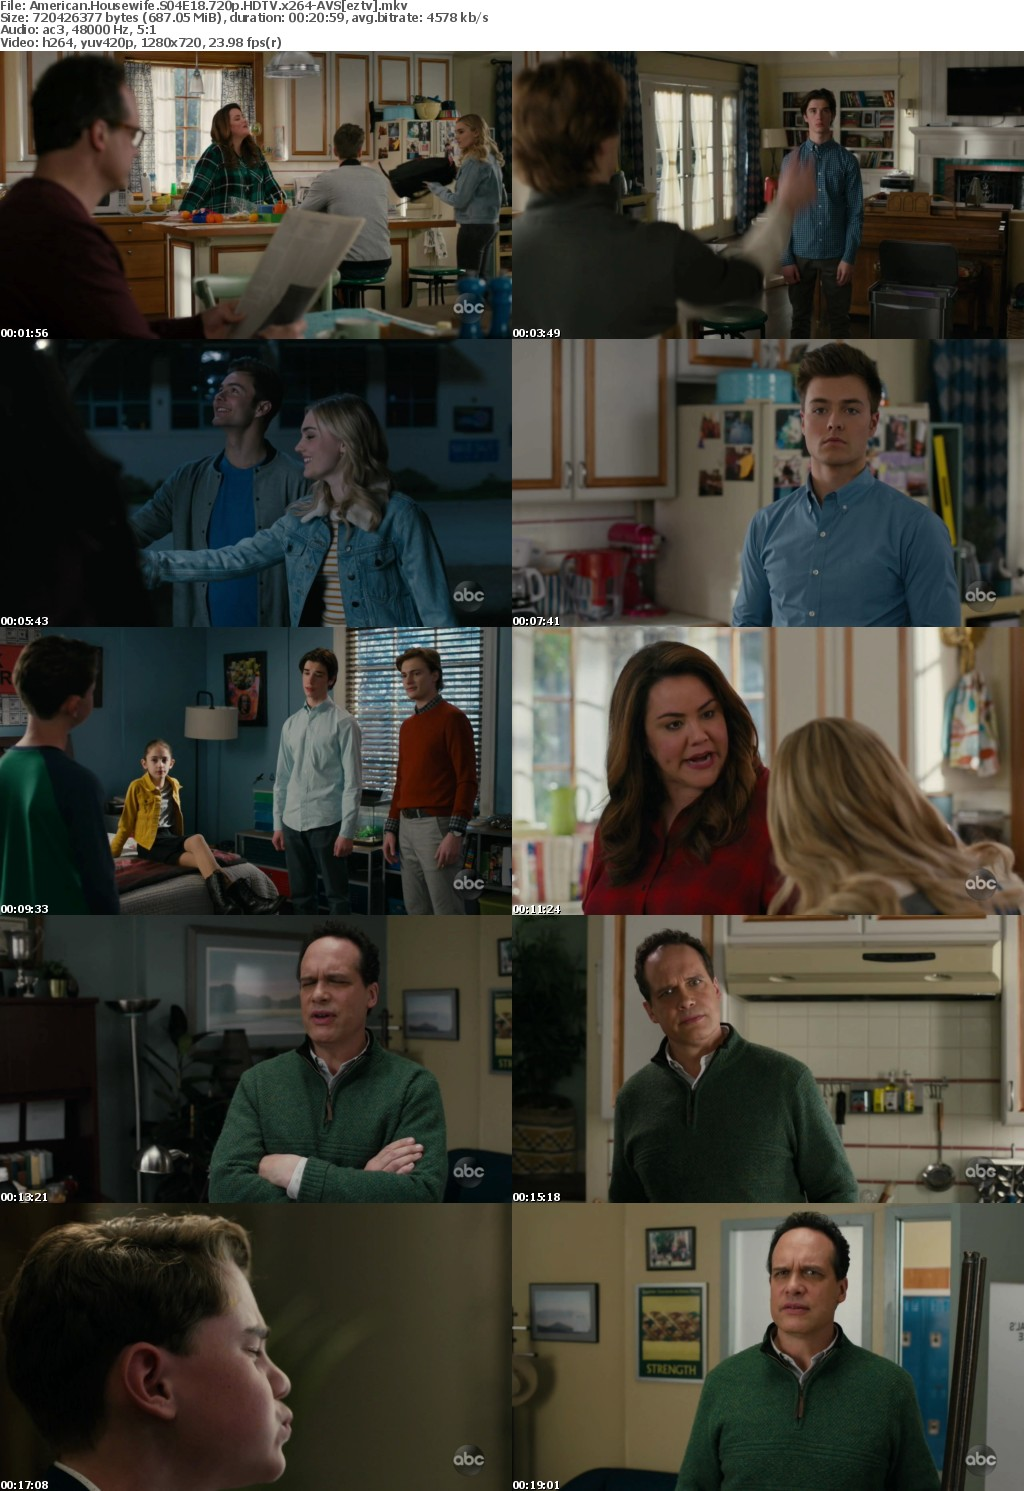 American Housewife S04E18 720p HDTV x264-AVS